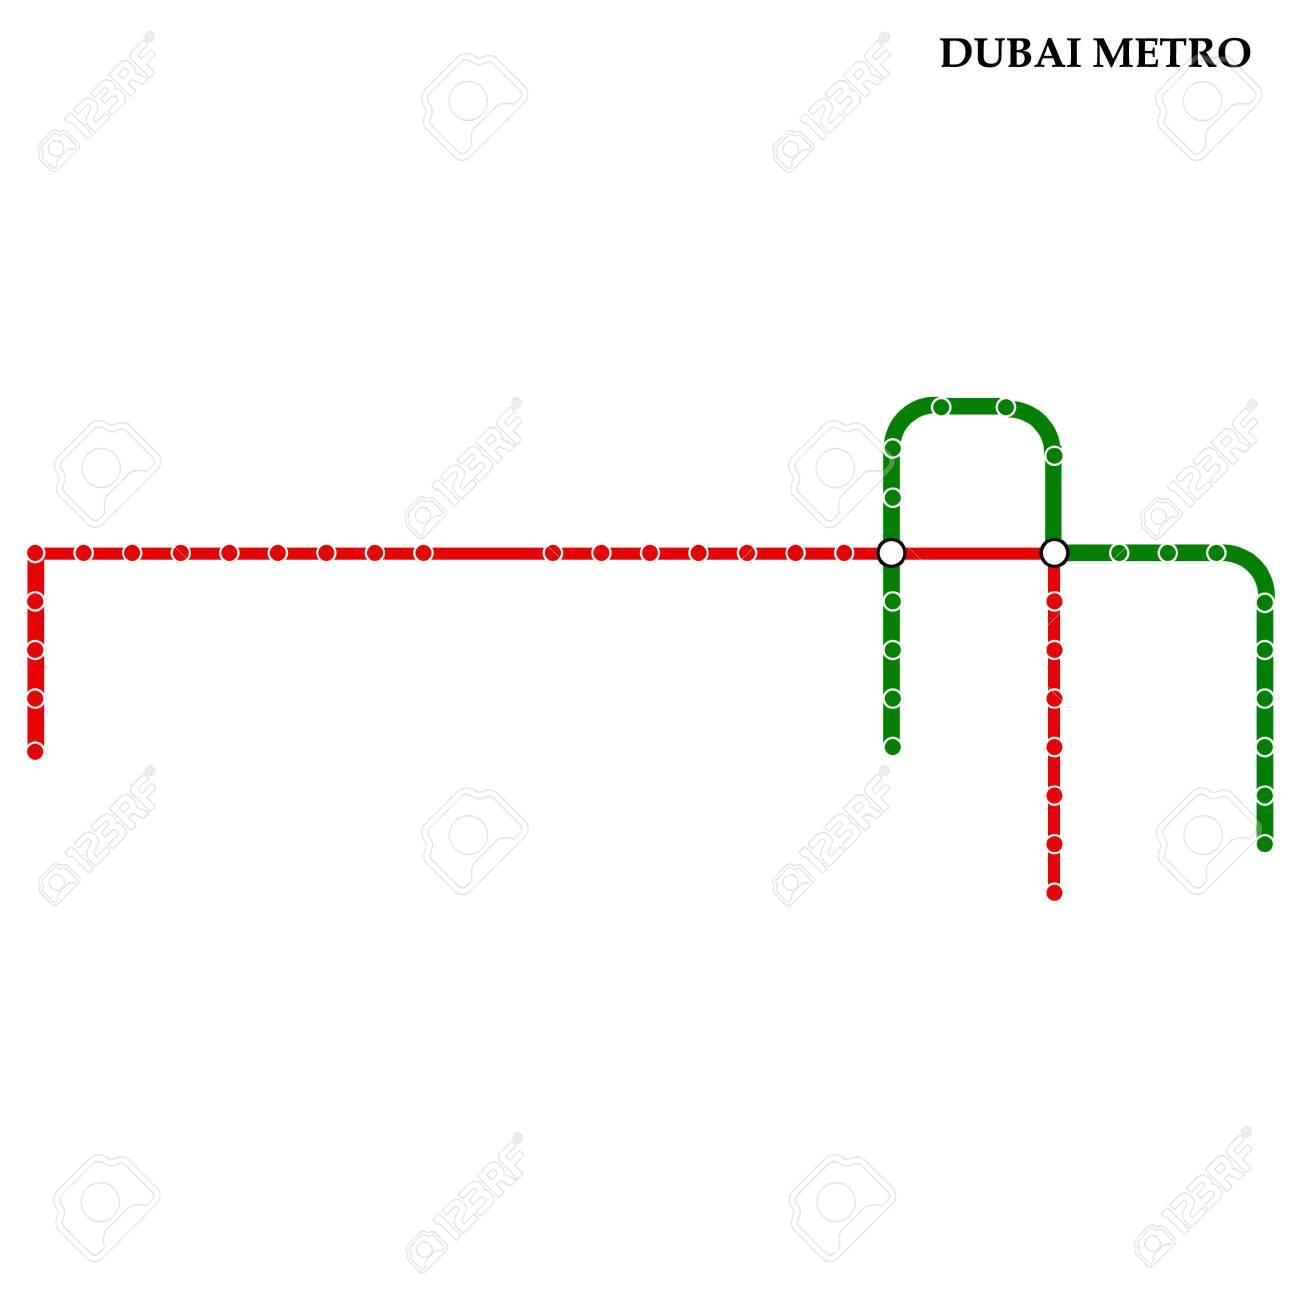 Dubai Subway Map.Map Of The Dubai Metro Subway Template Of City Transportation